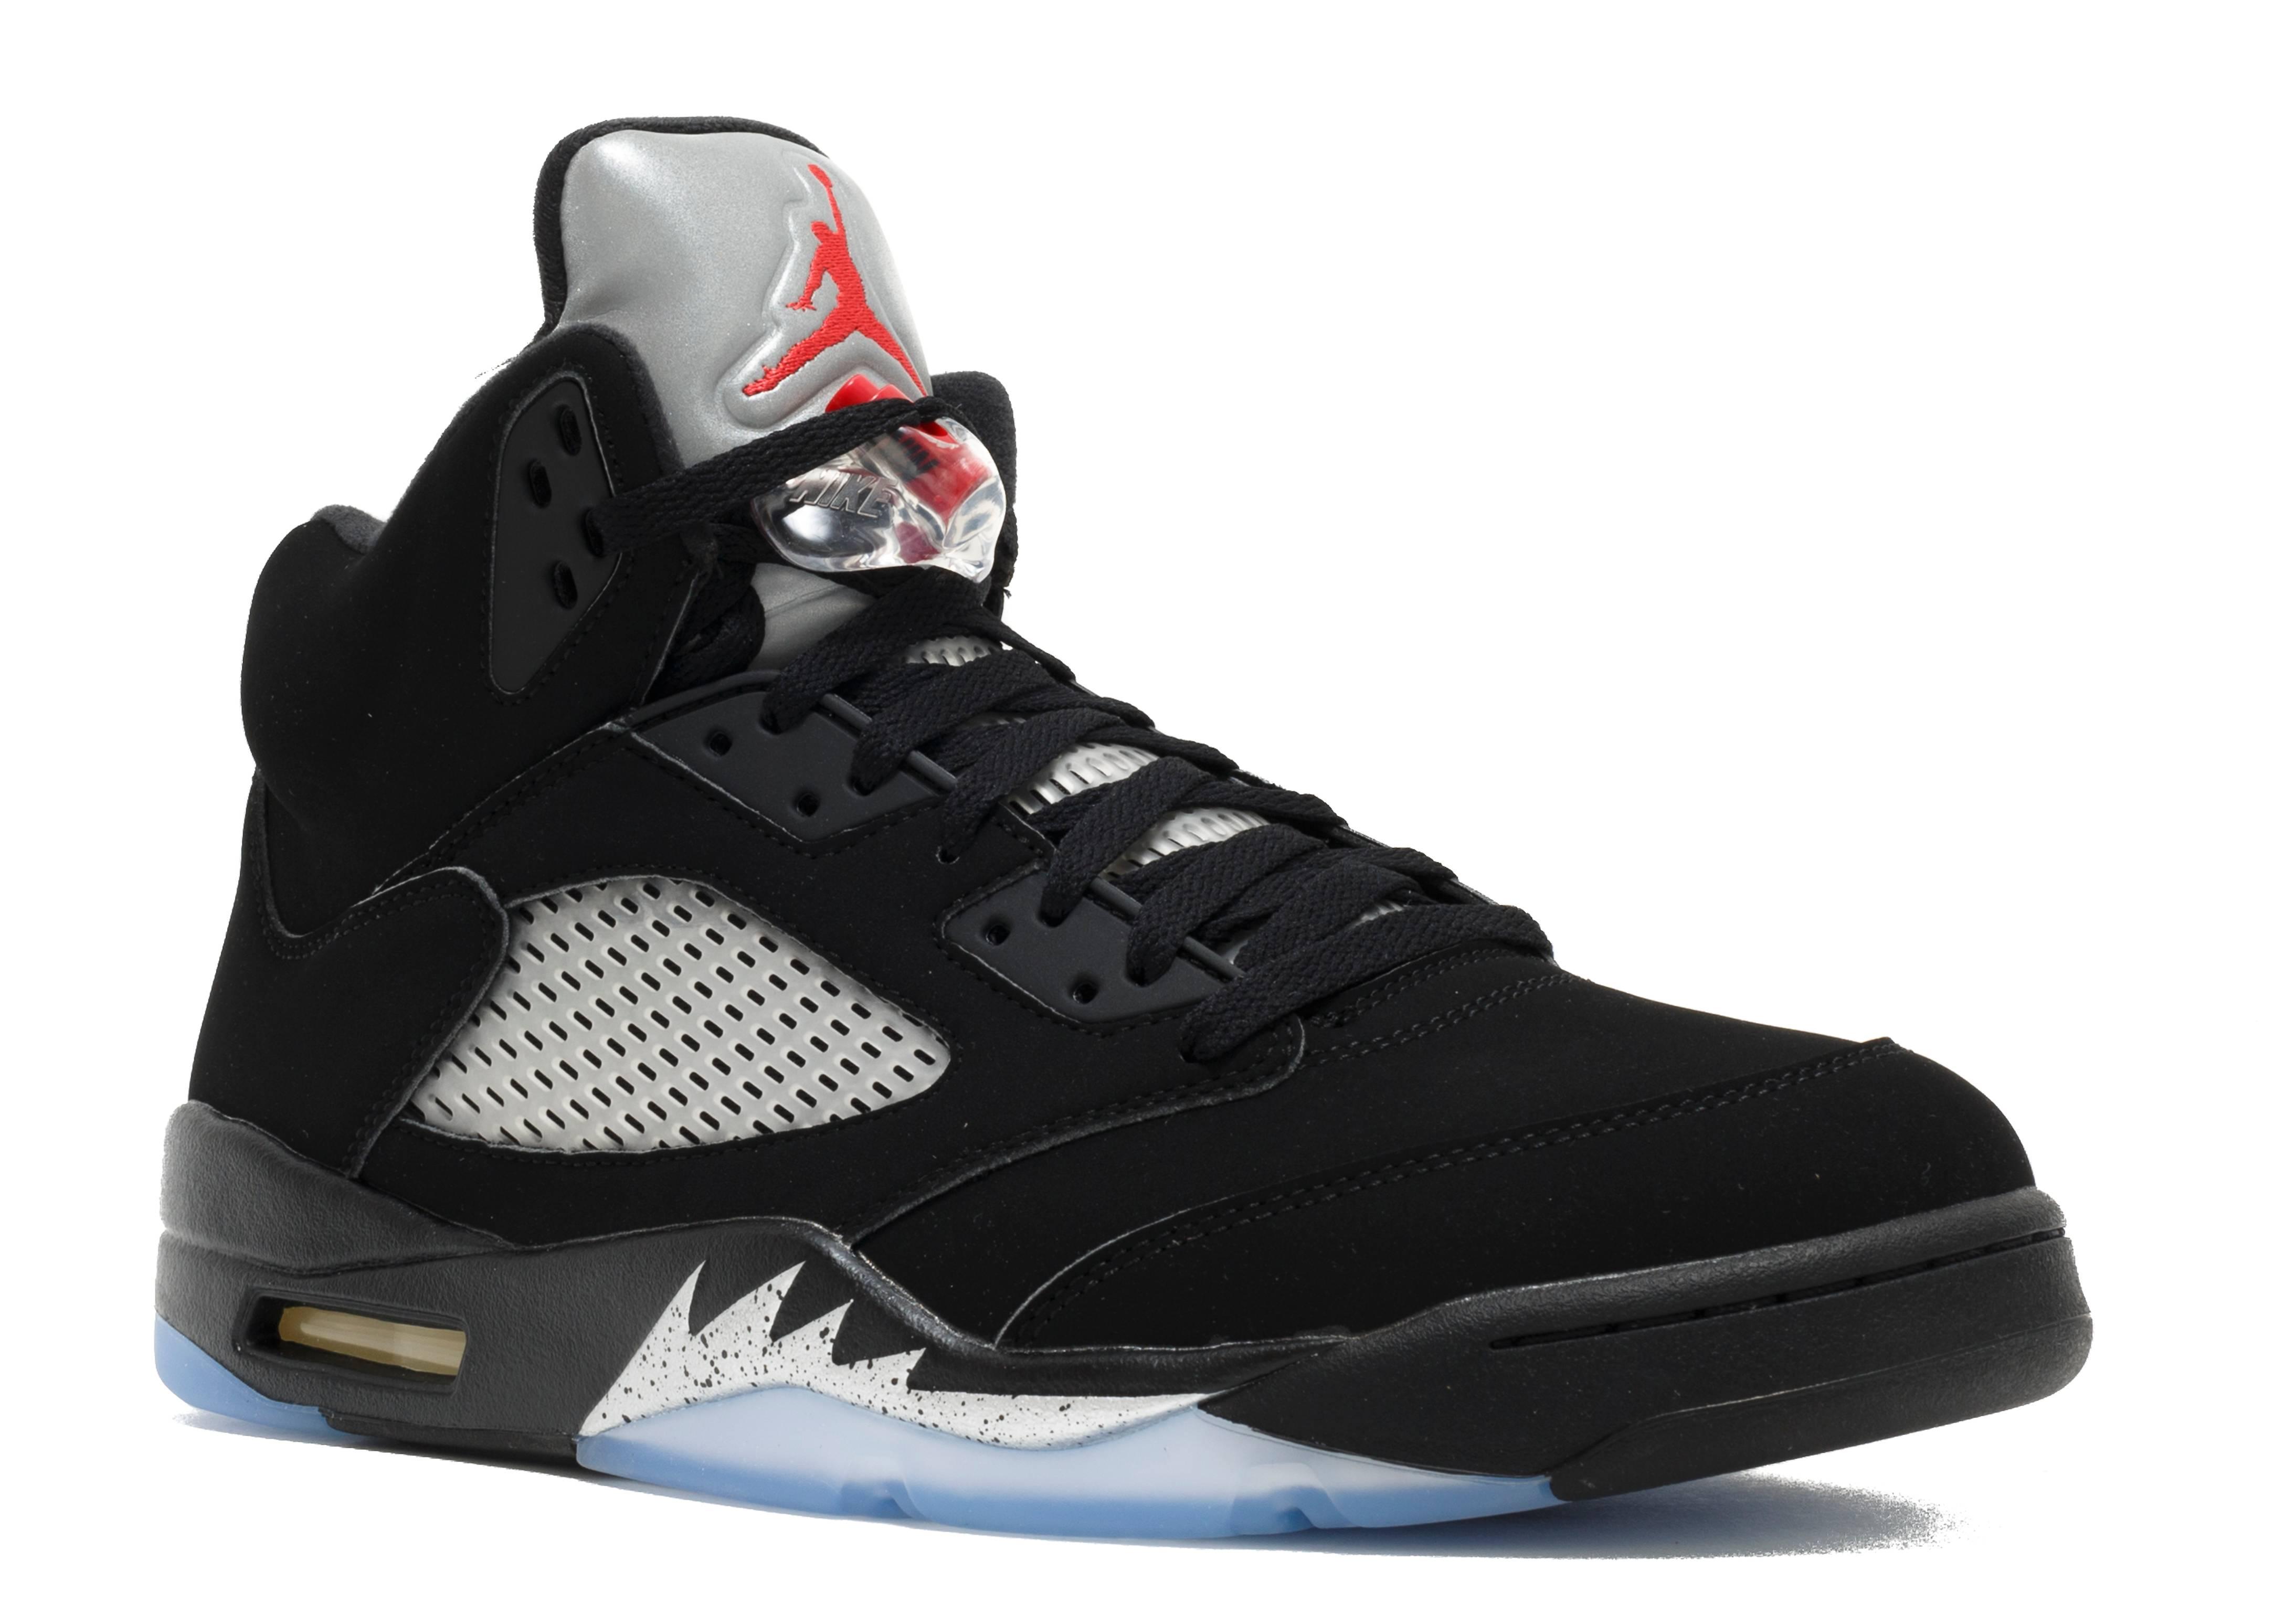 "pictures of black and white jordans – Air Jordan 2 Retro Qf Air Jordan black white. Source:neavrestpa.ml Source:neavrestpa.ml pictures of black and white jordans – Air Jordan 14 Retro "" Release"" Air Jordan"